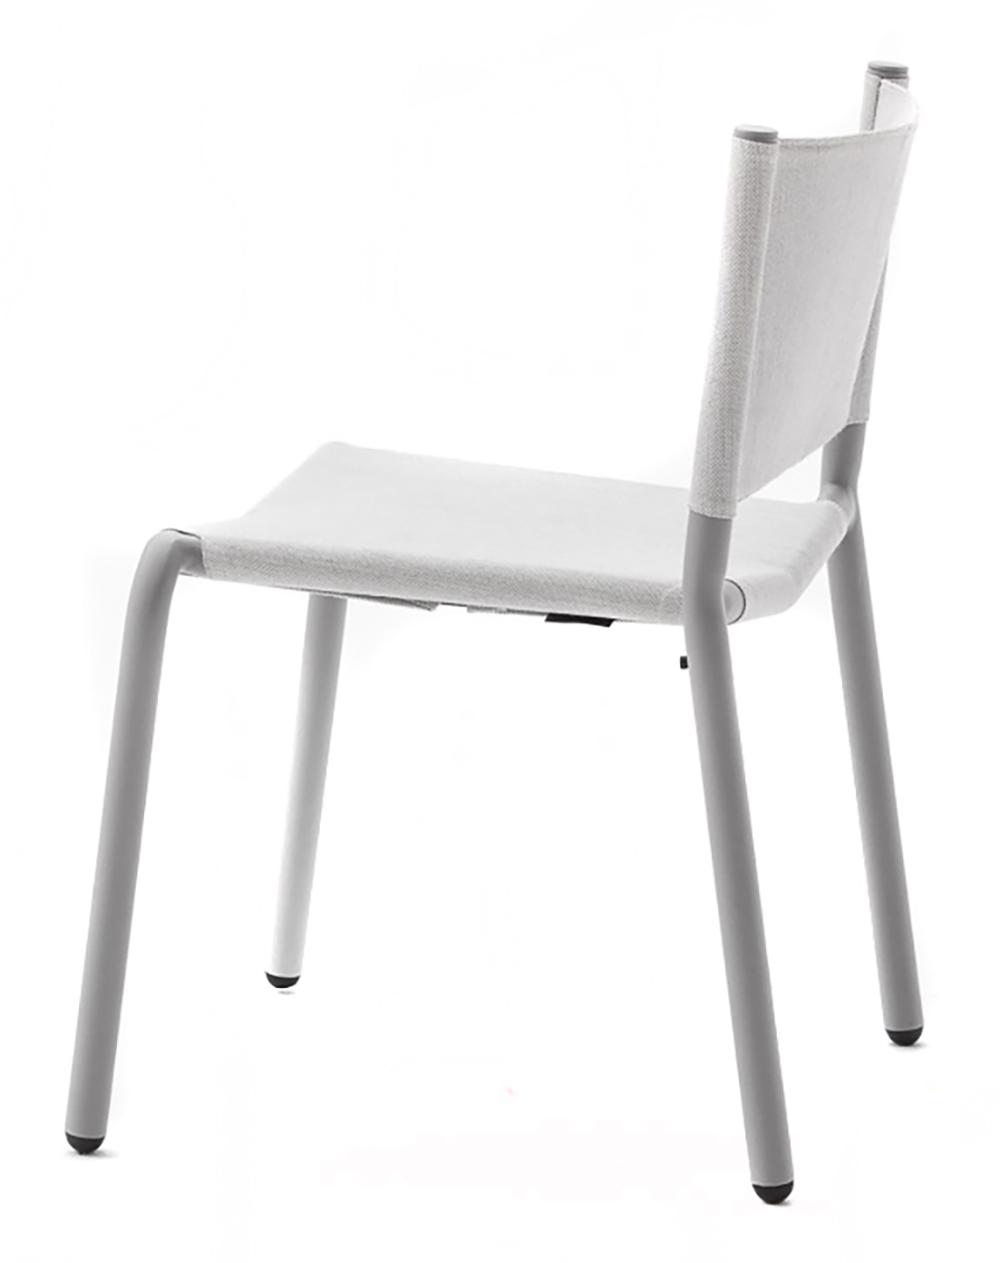 Cadeira Vela • estudiobola